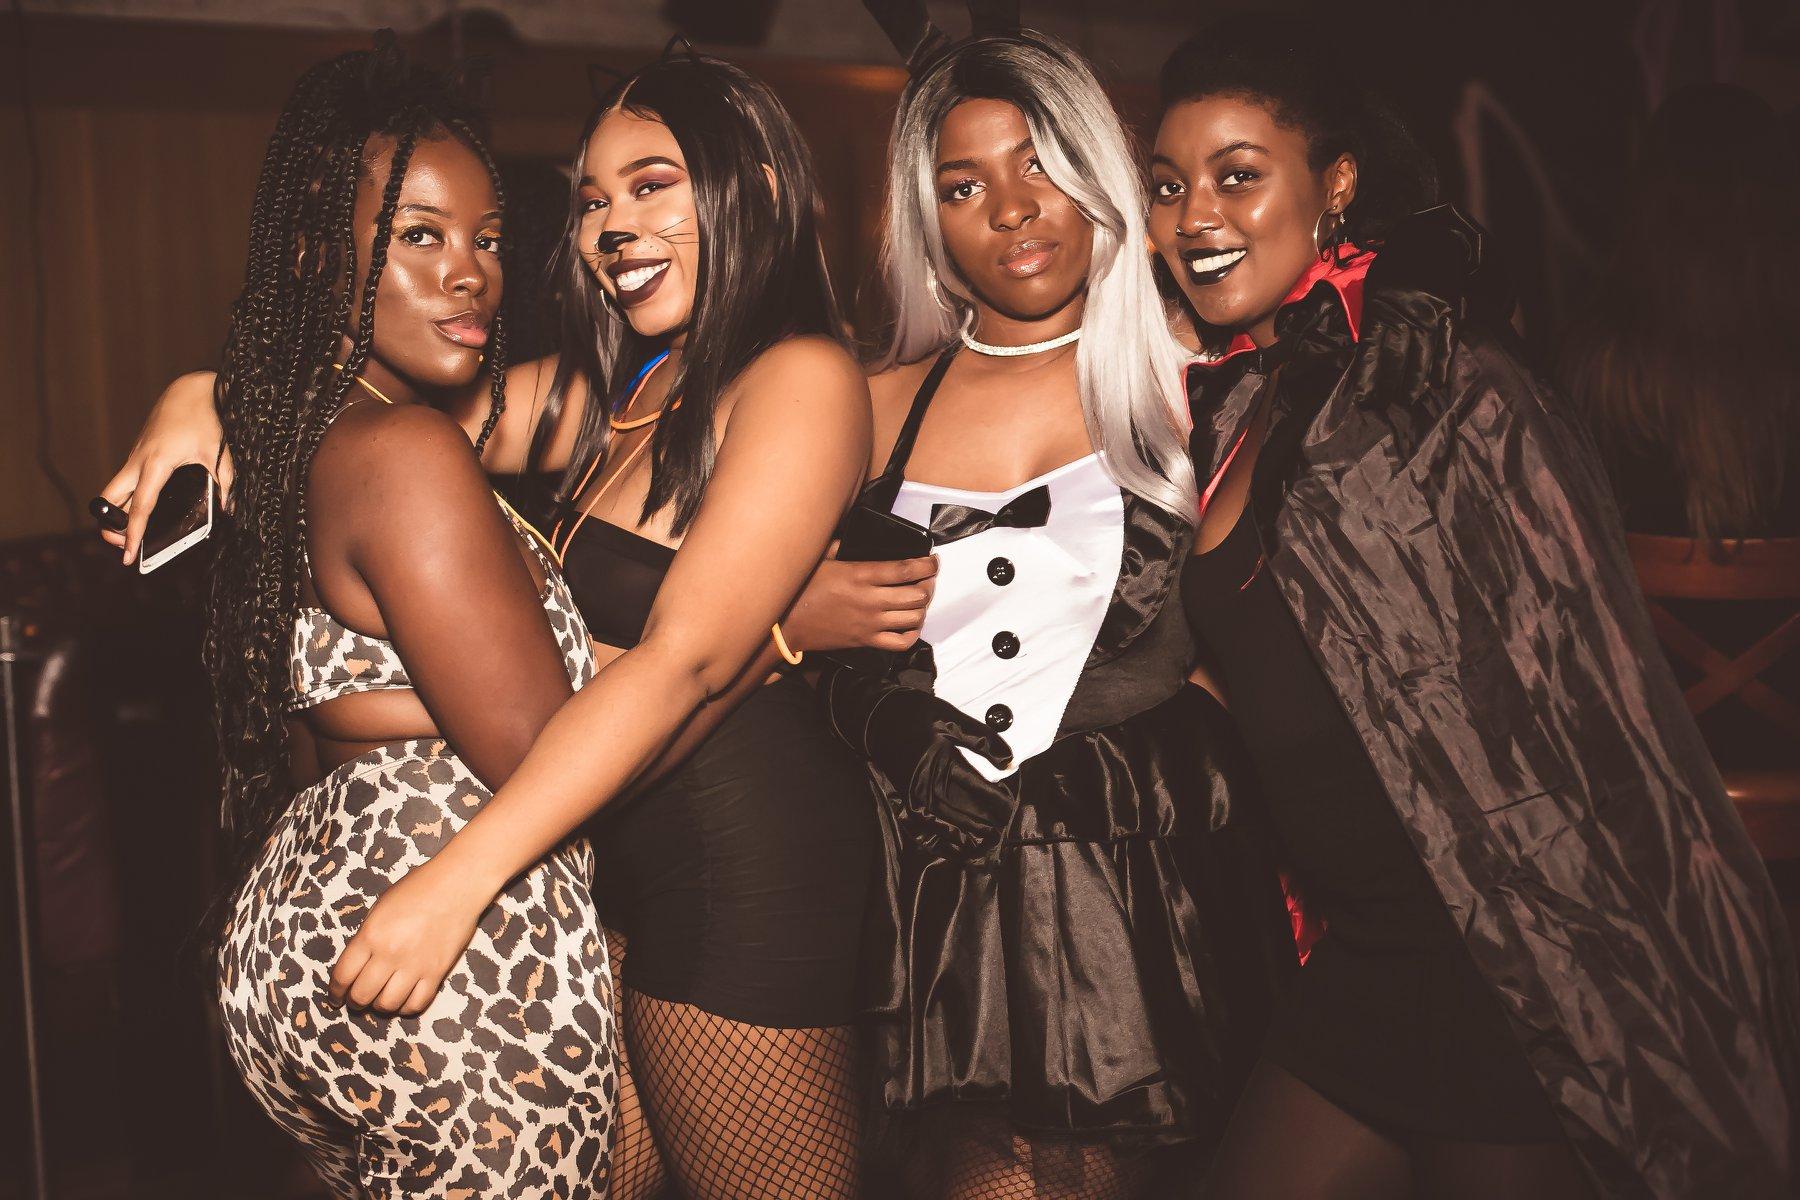 Haunted LDN - London's Biggest Halloween Party